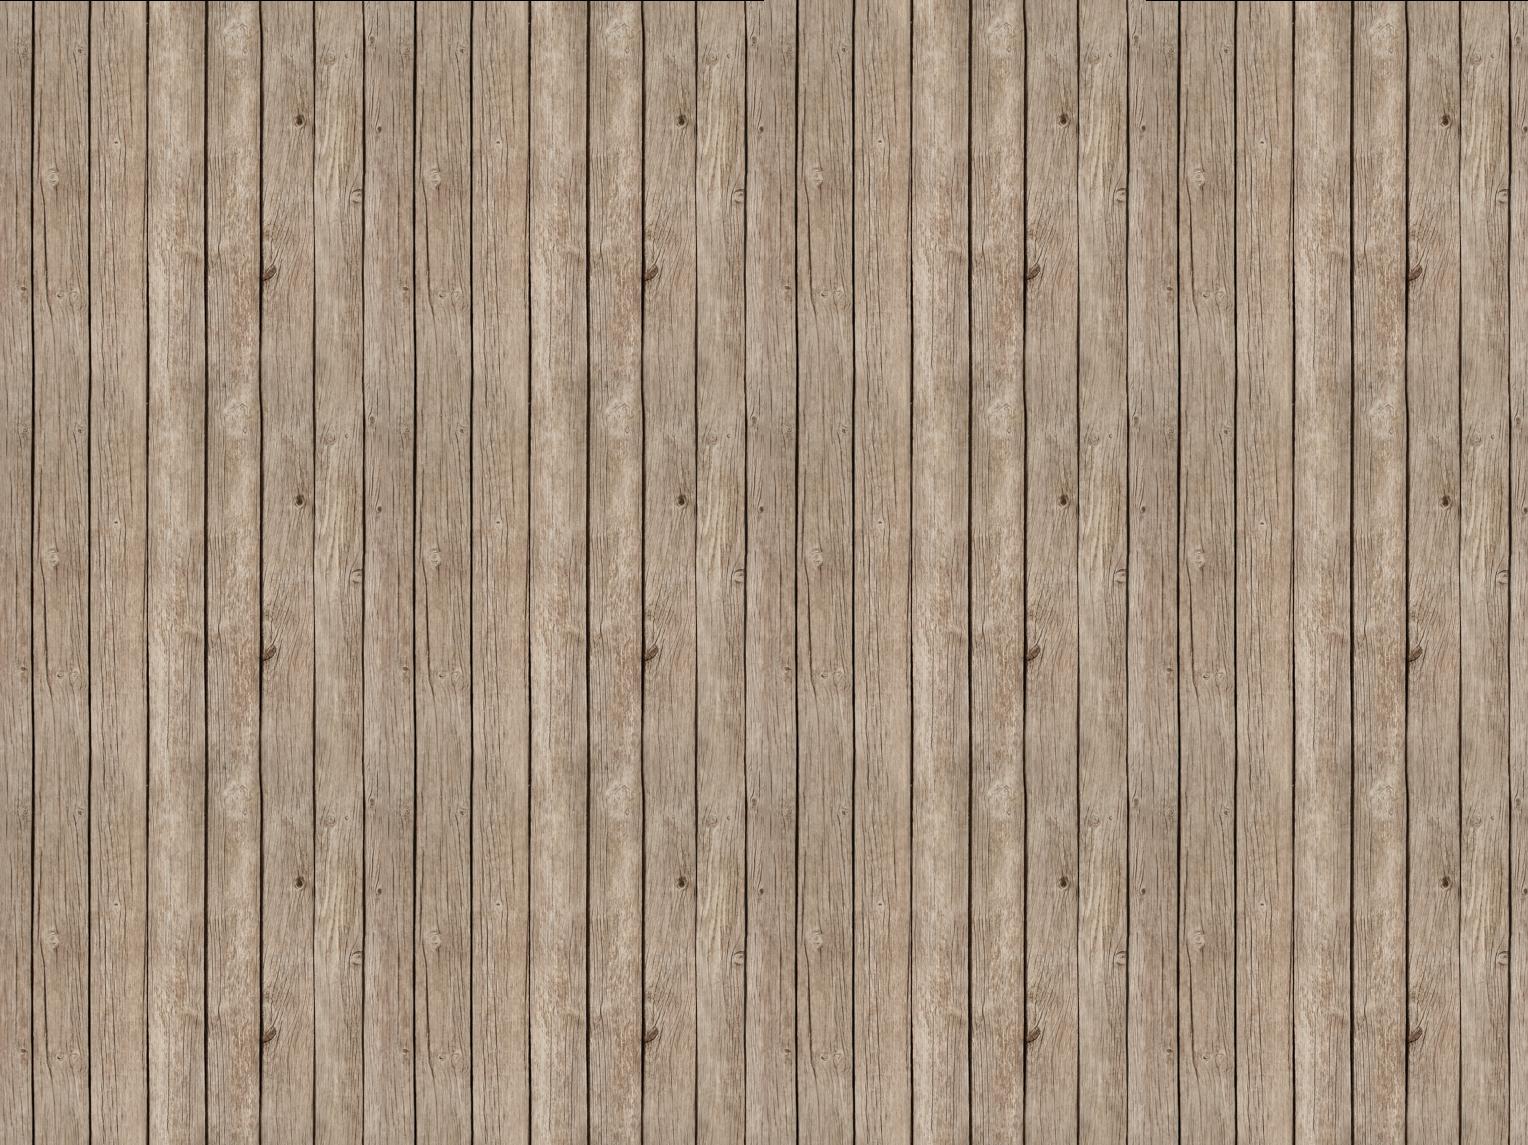 printable flooring 1528x1145